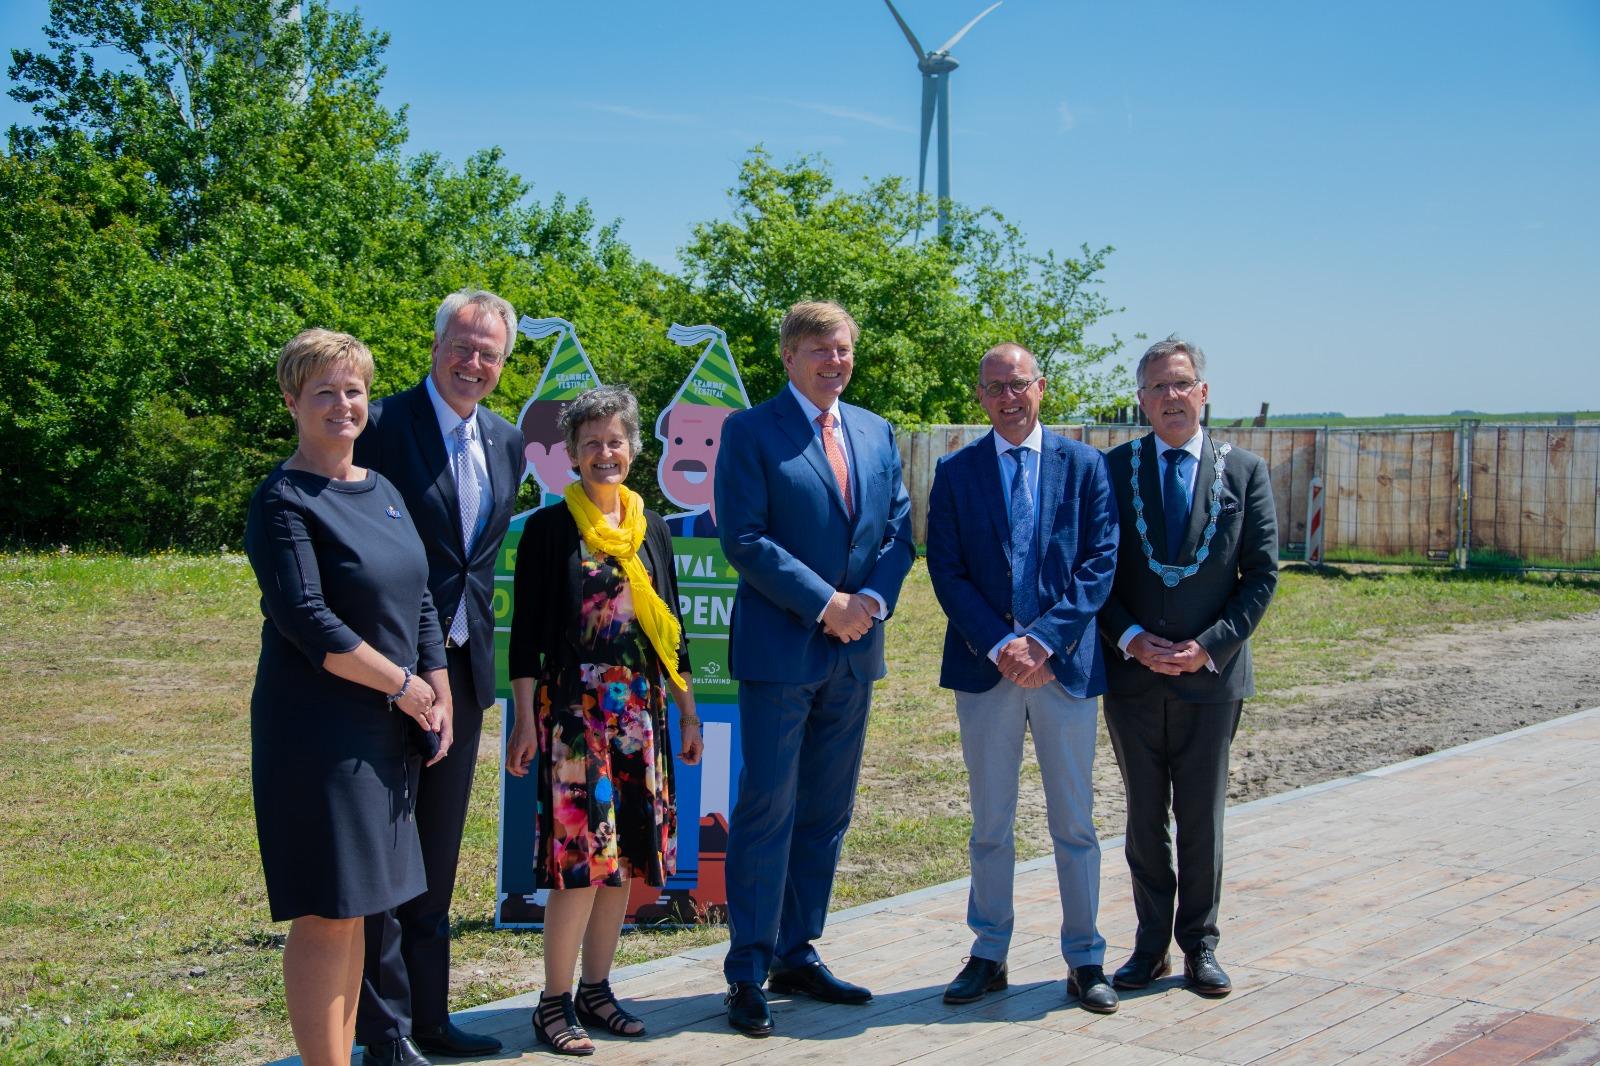 Opening Windpark Krammer door Koning Willem-Alexander